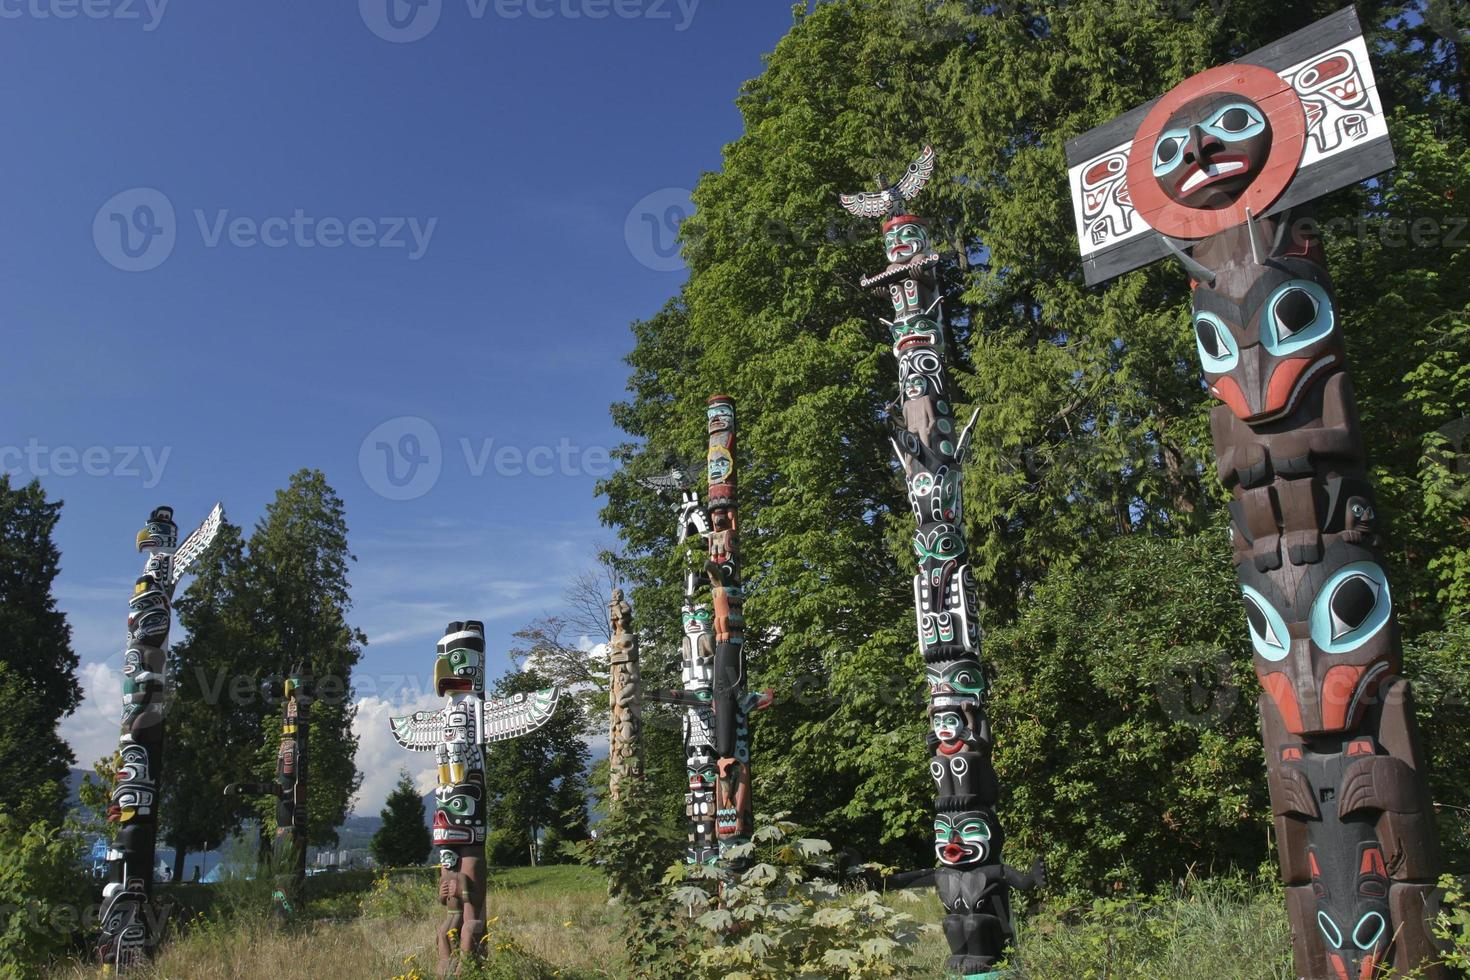 totempalen in Stanley Park, BC Vancouver foto